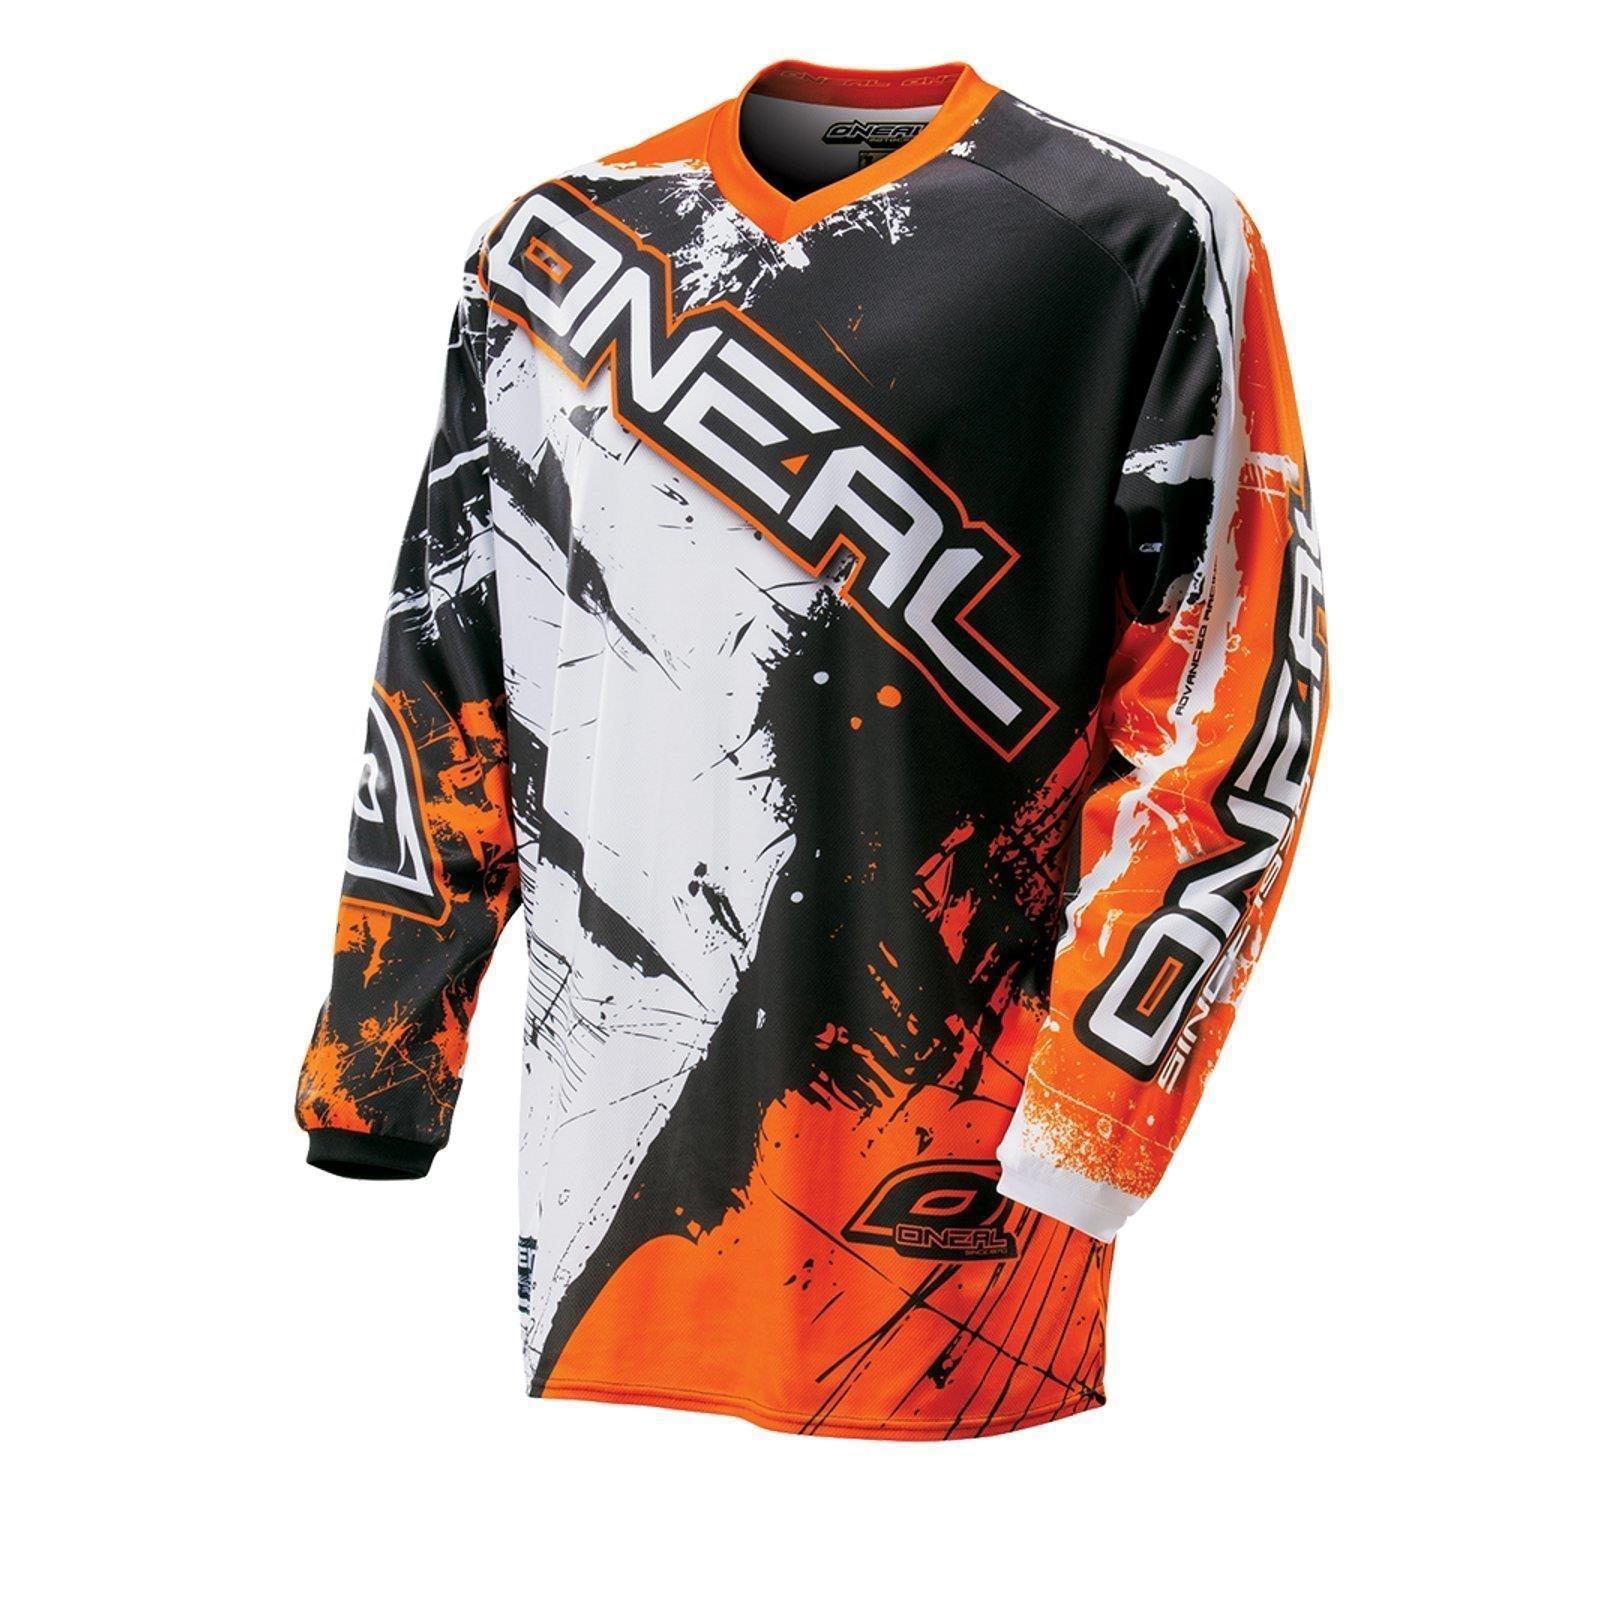 Oneal-elemento-ninos-MX-Jersey-pantalones-Shocker-Moto-Cross-Enduro-Mountainbike-MTB miniatura 13